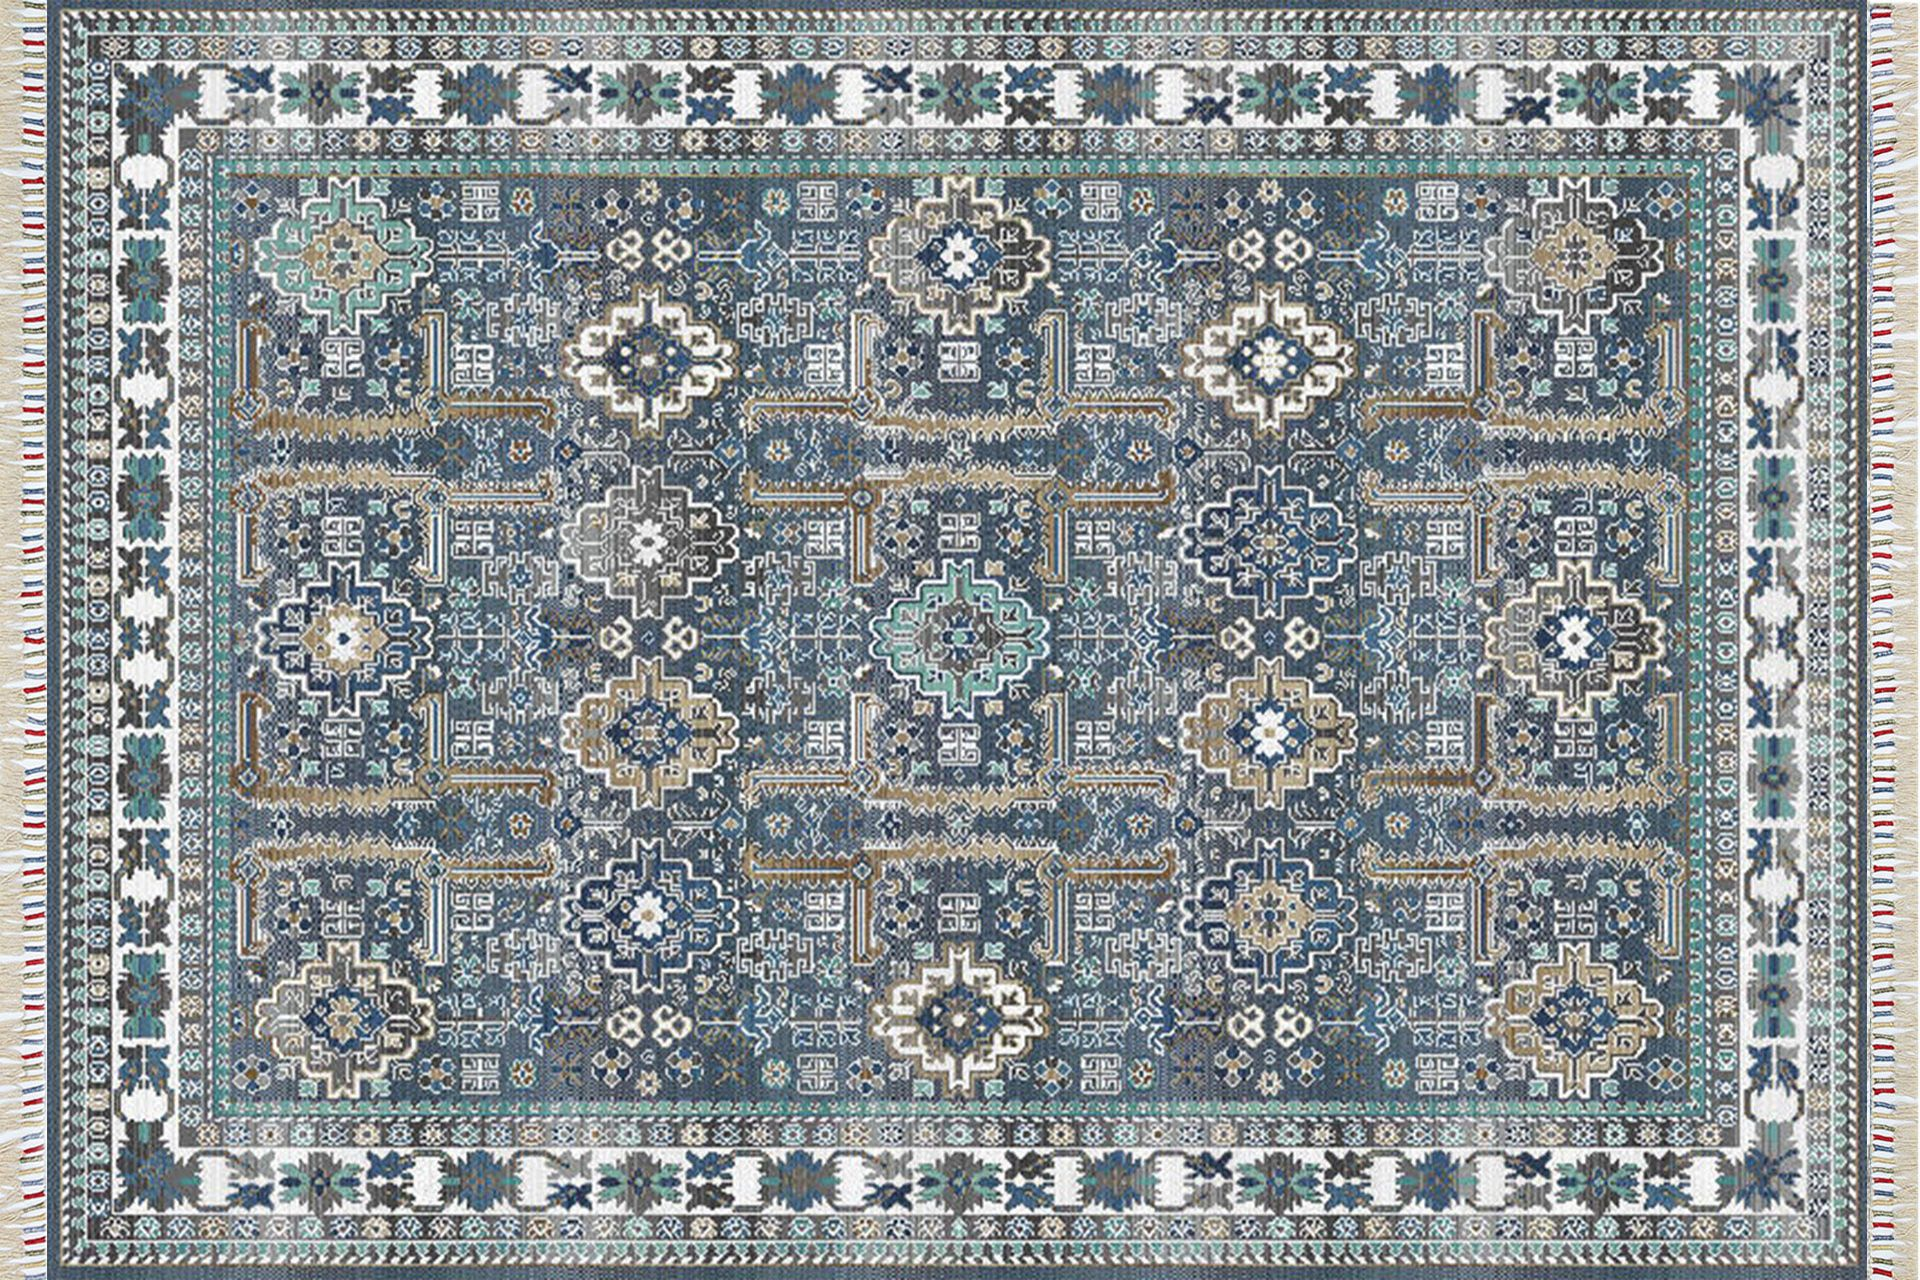 PARMA PRM 07 BLUE ETNİK YIKANABİLİR HALI 80x150